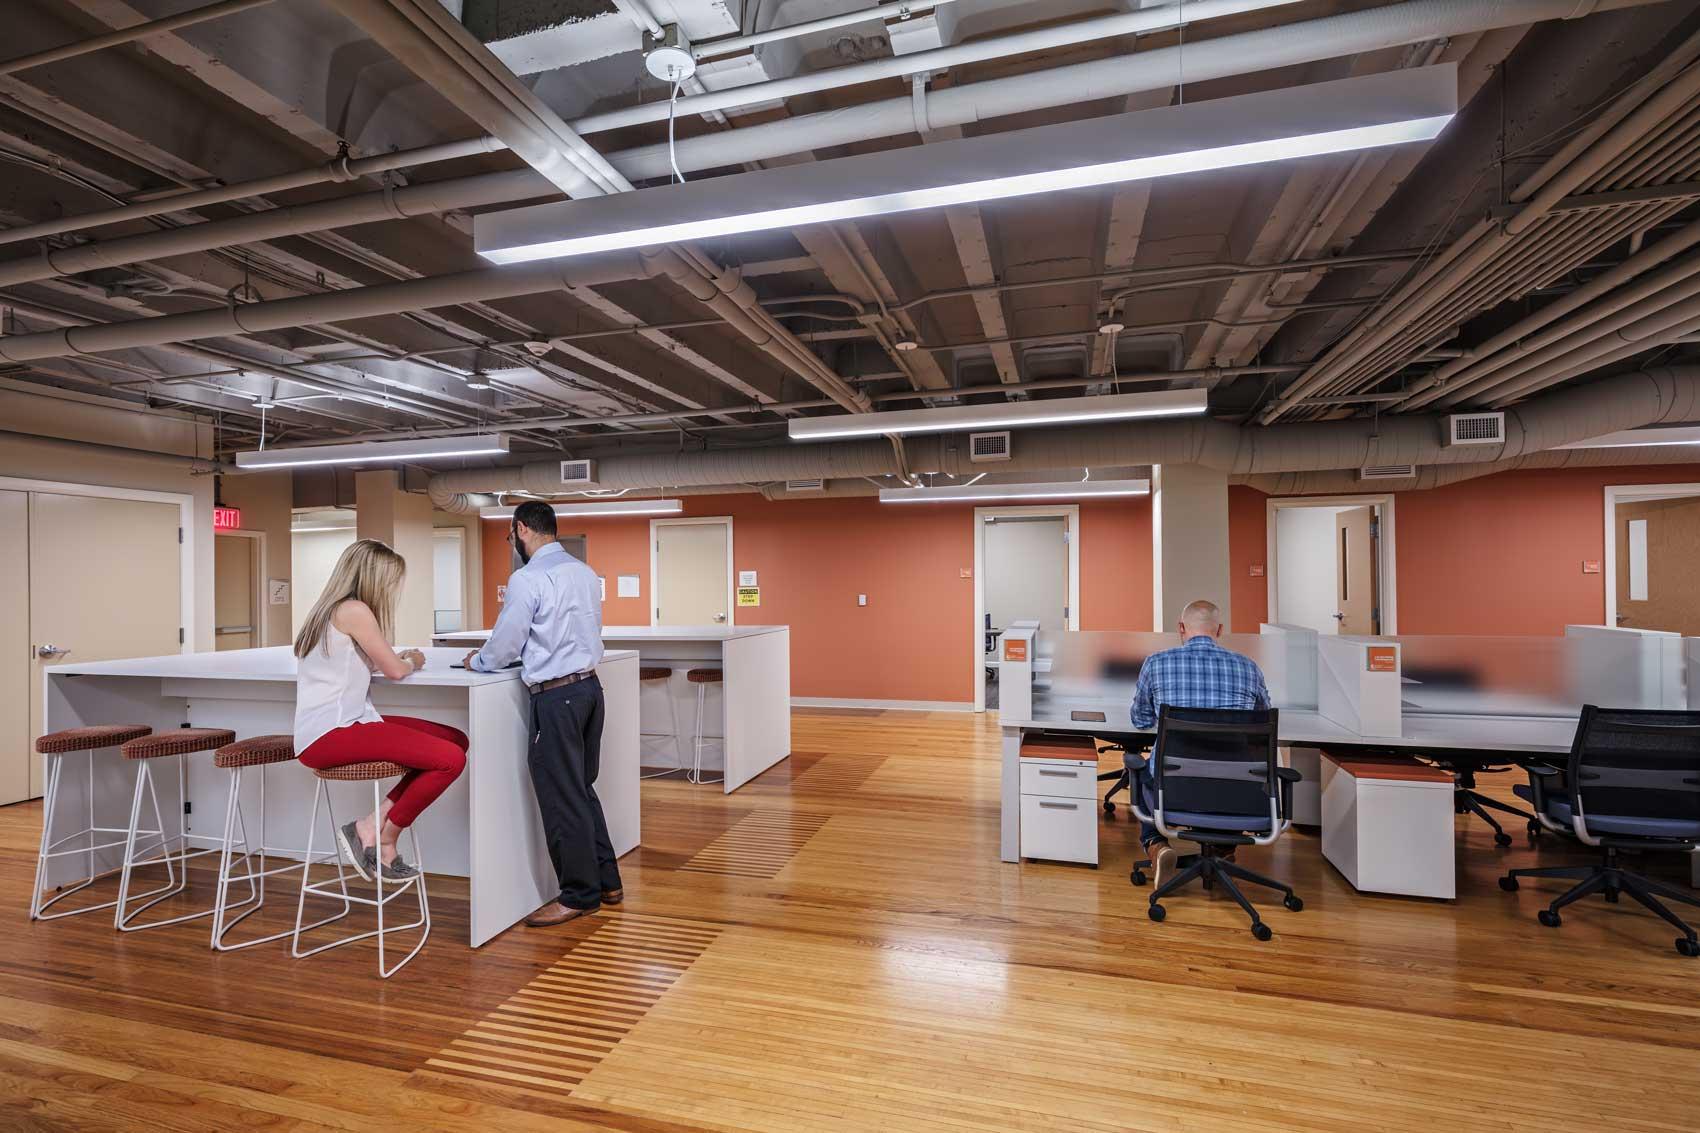 Columbus ywca berardi partners for Select kitchen design columbus ohio